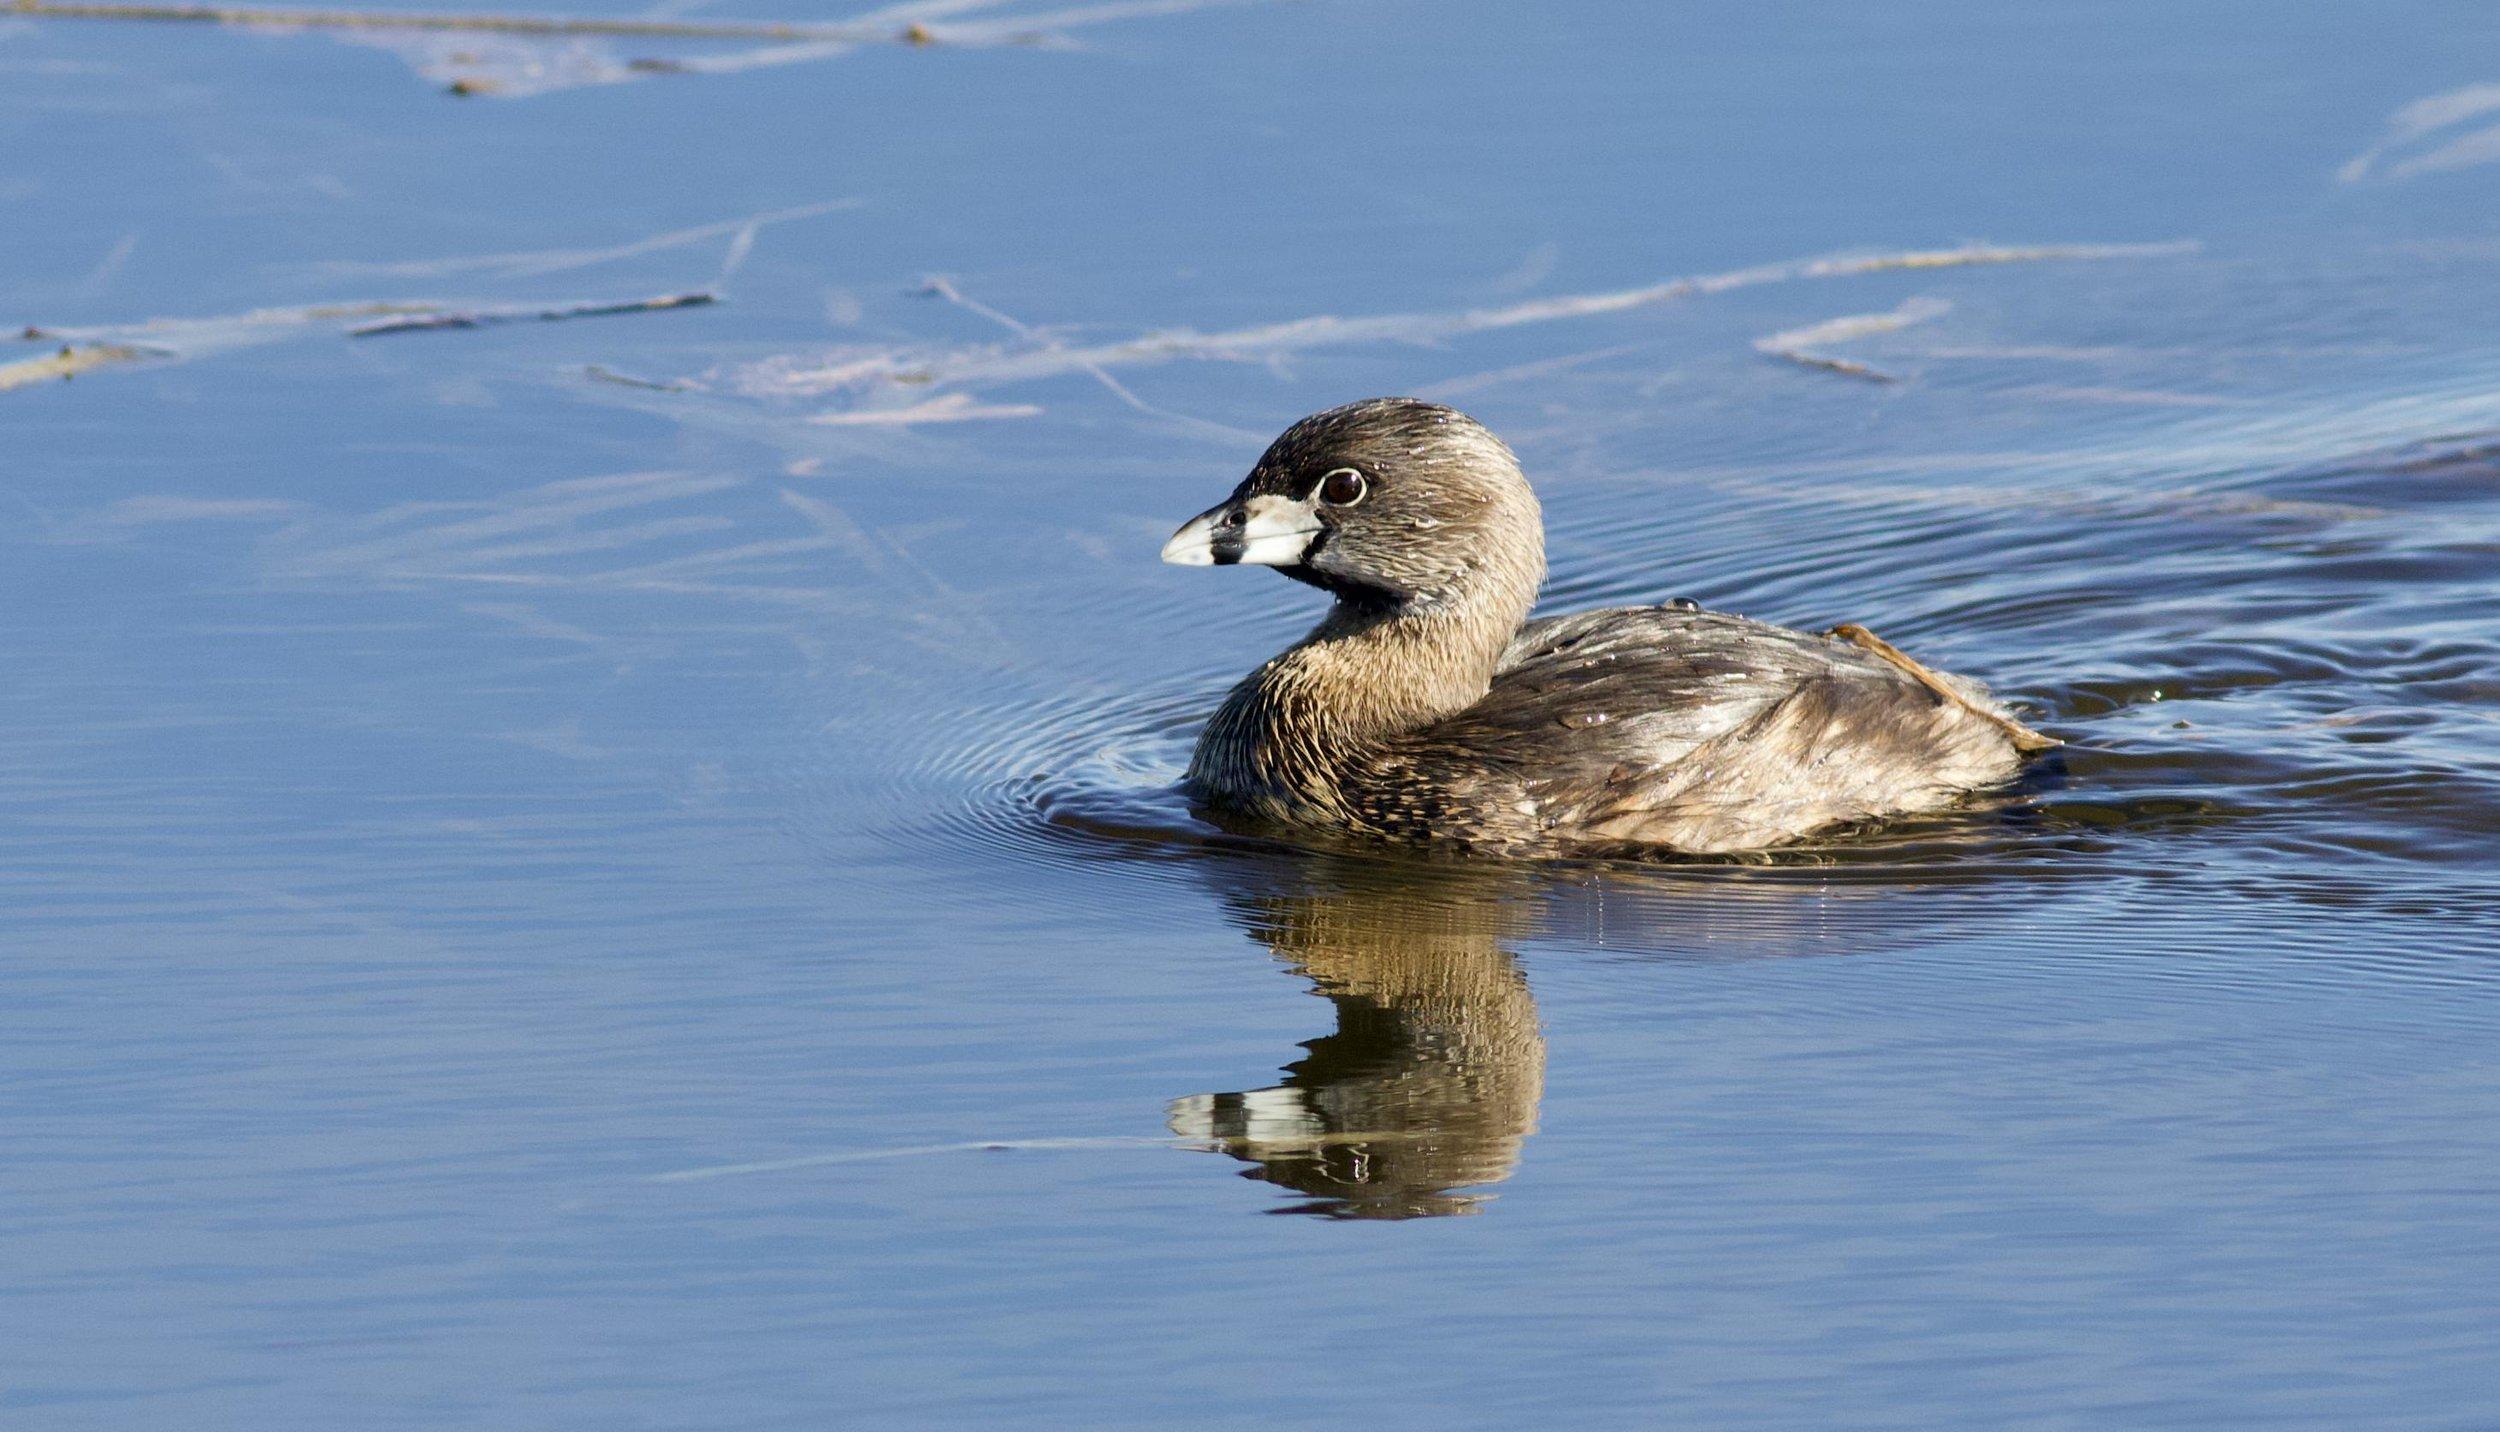 A pied-billed grebe paddles through Goose Pond. Photo by Arlene Koziol